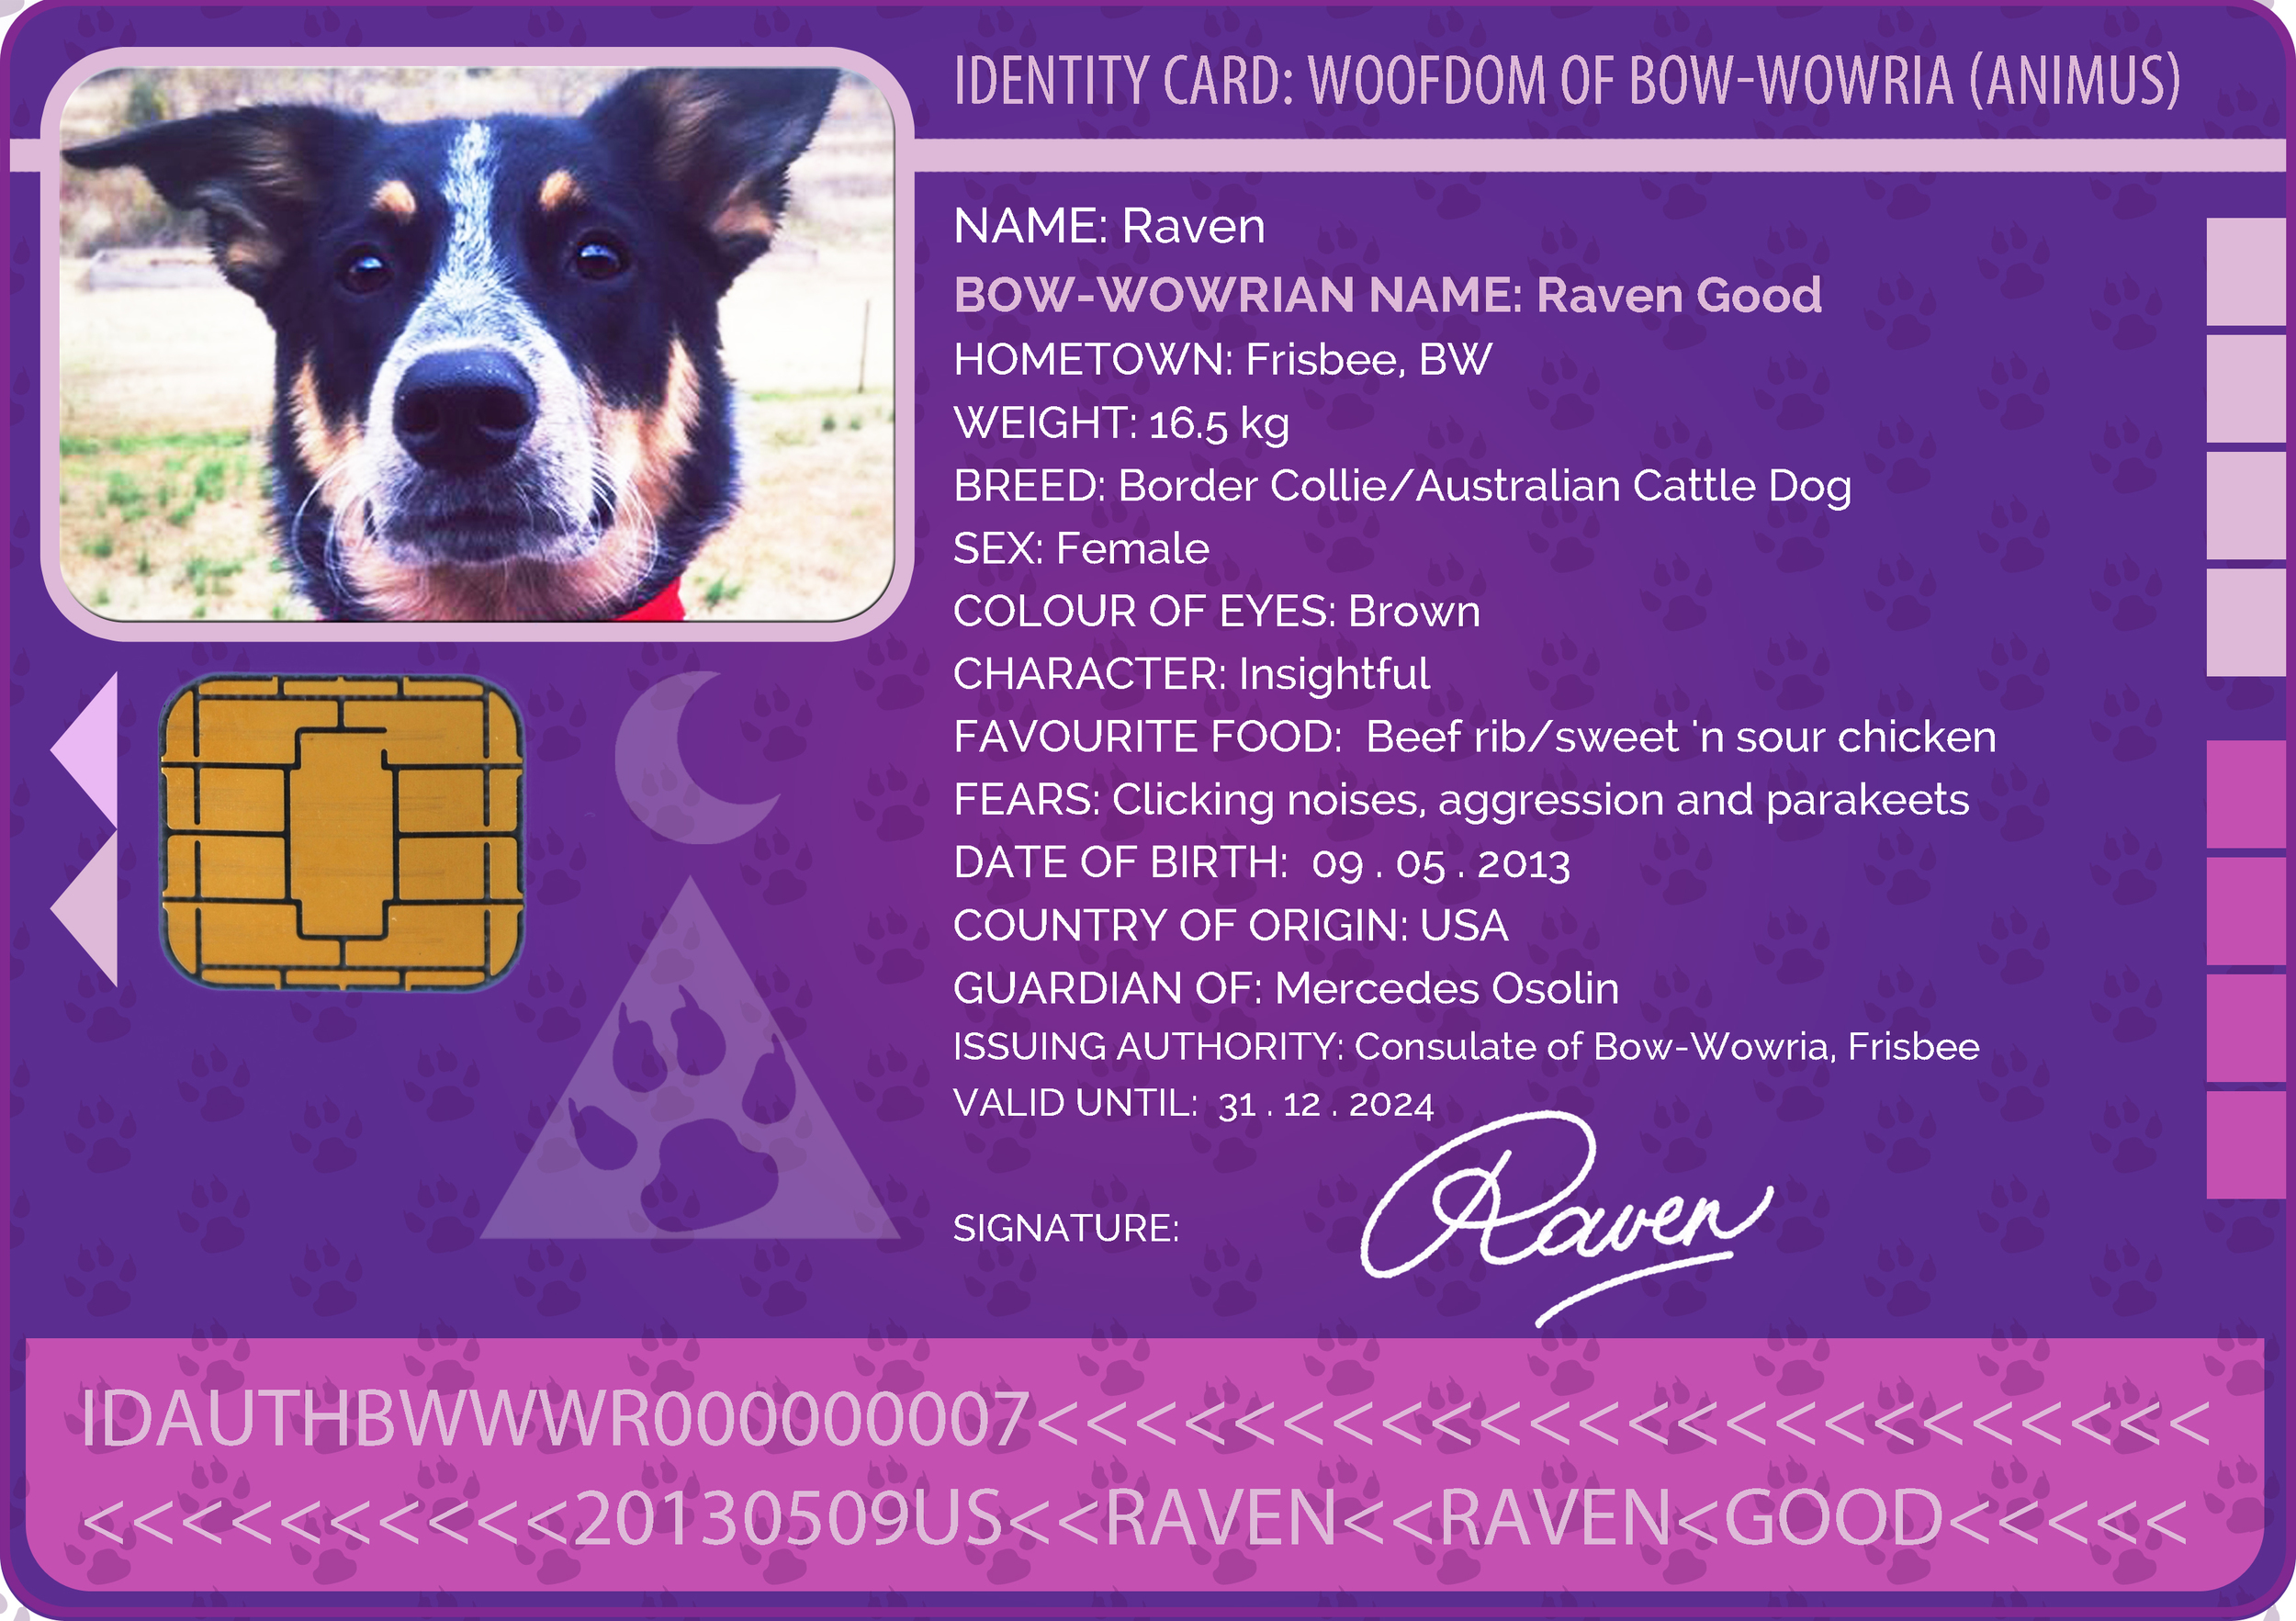 Raven Good of Frisbee